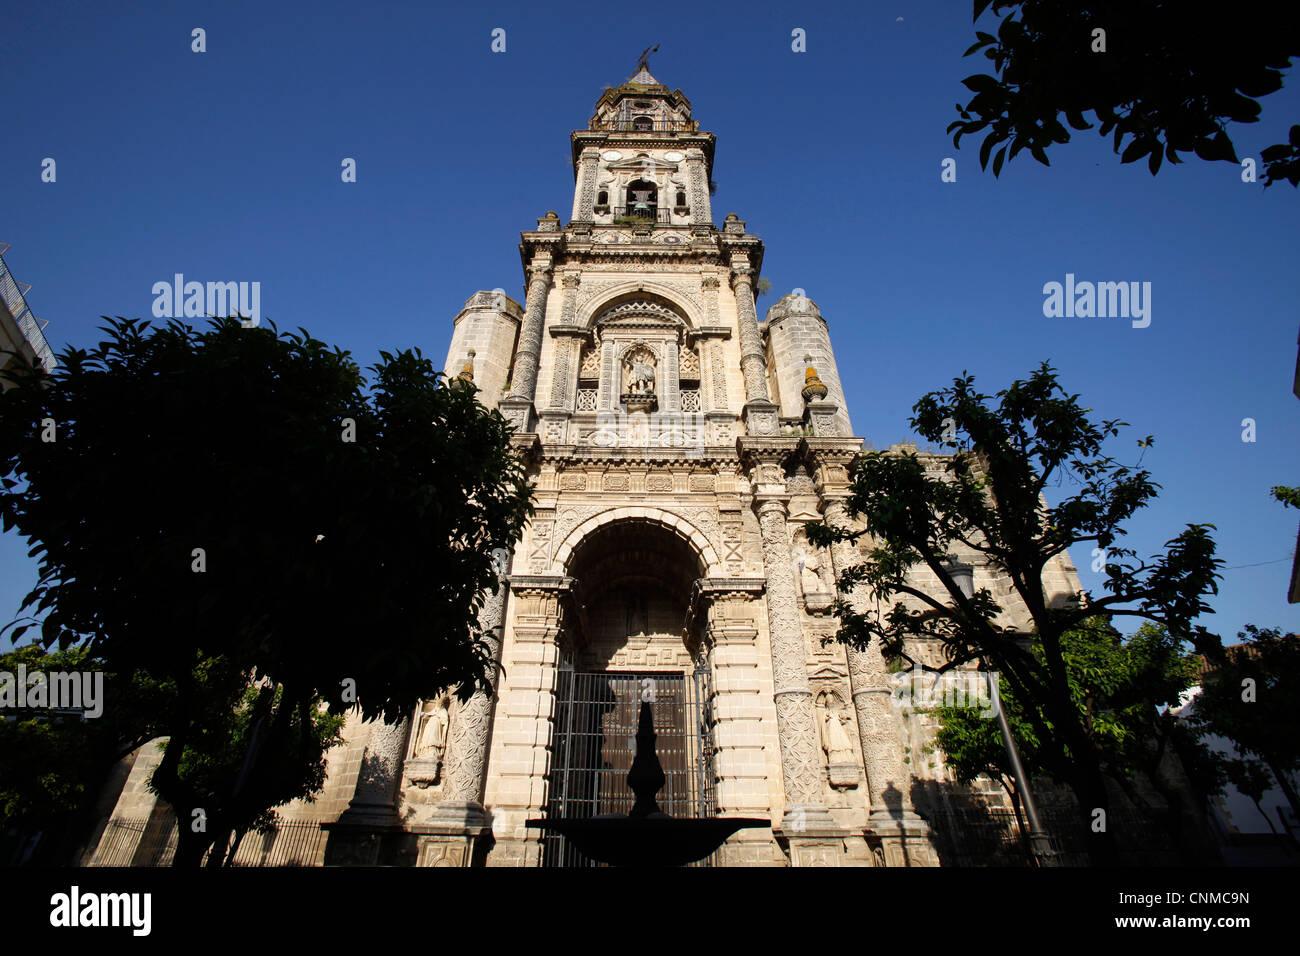 St. Michael Kirche, Jerez De La Frontera, Andalusien, Spanien, Europa Stockbild